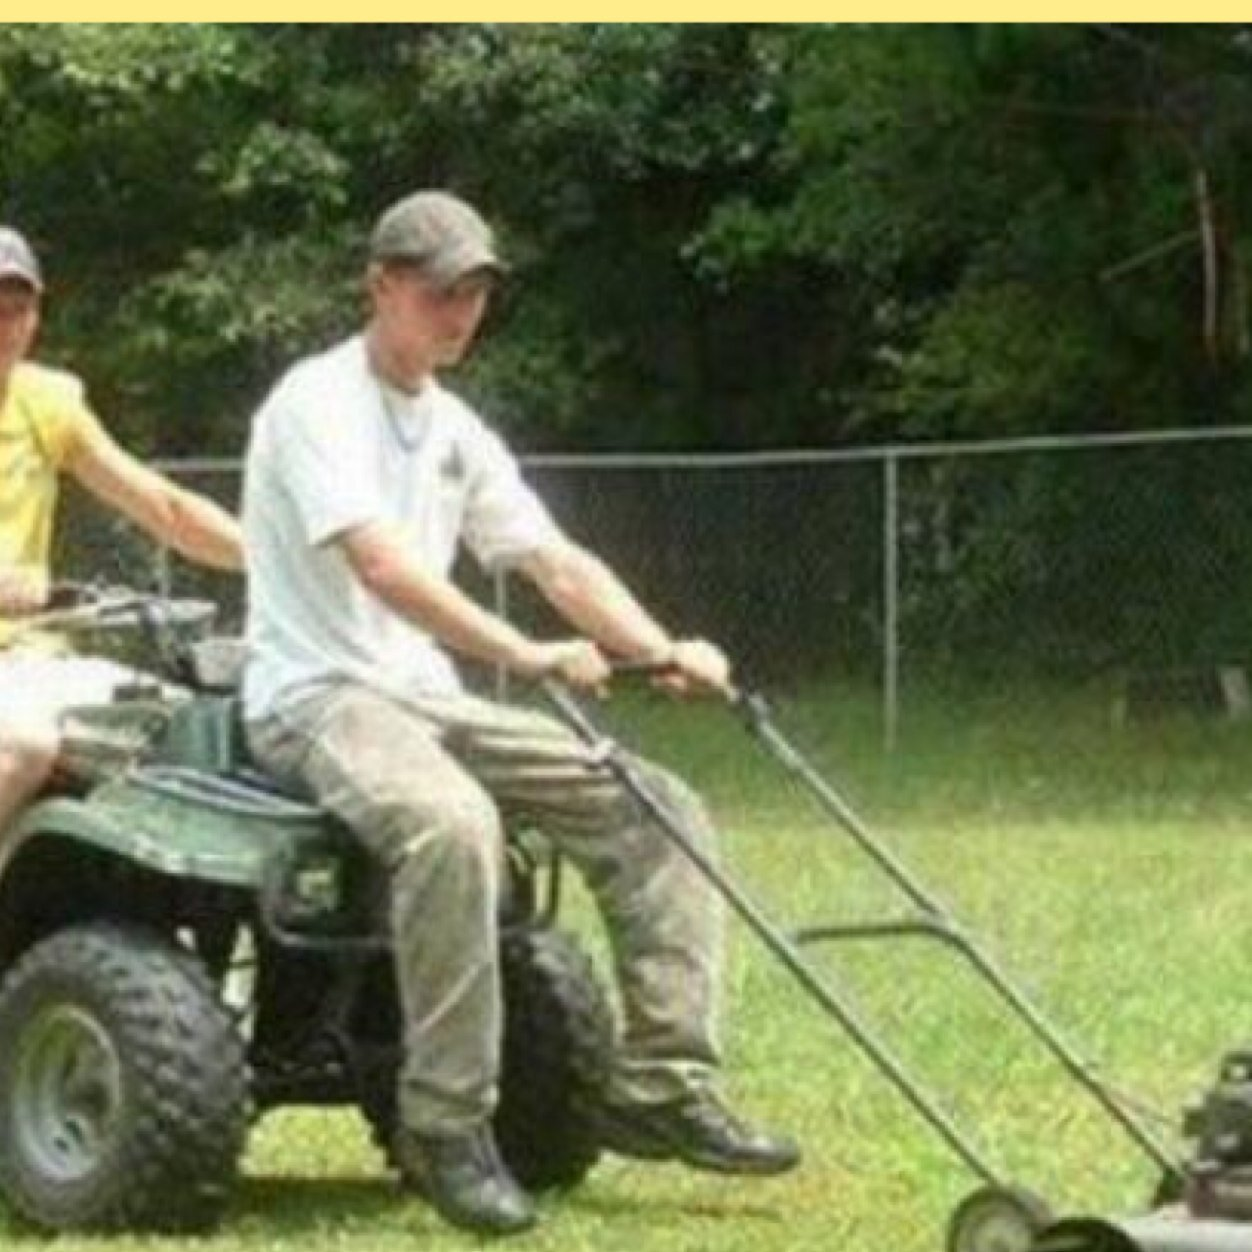 Top Notch Lawn Care